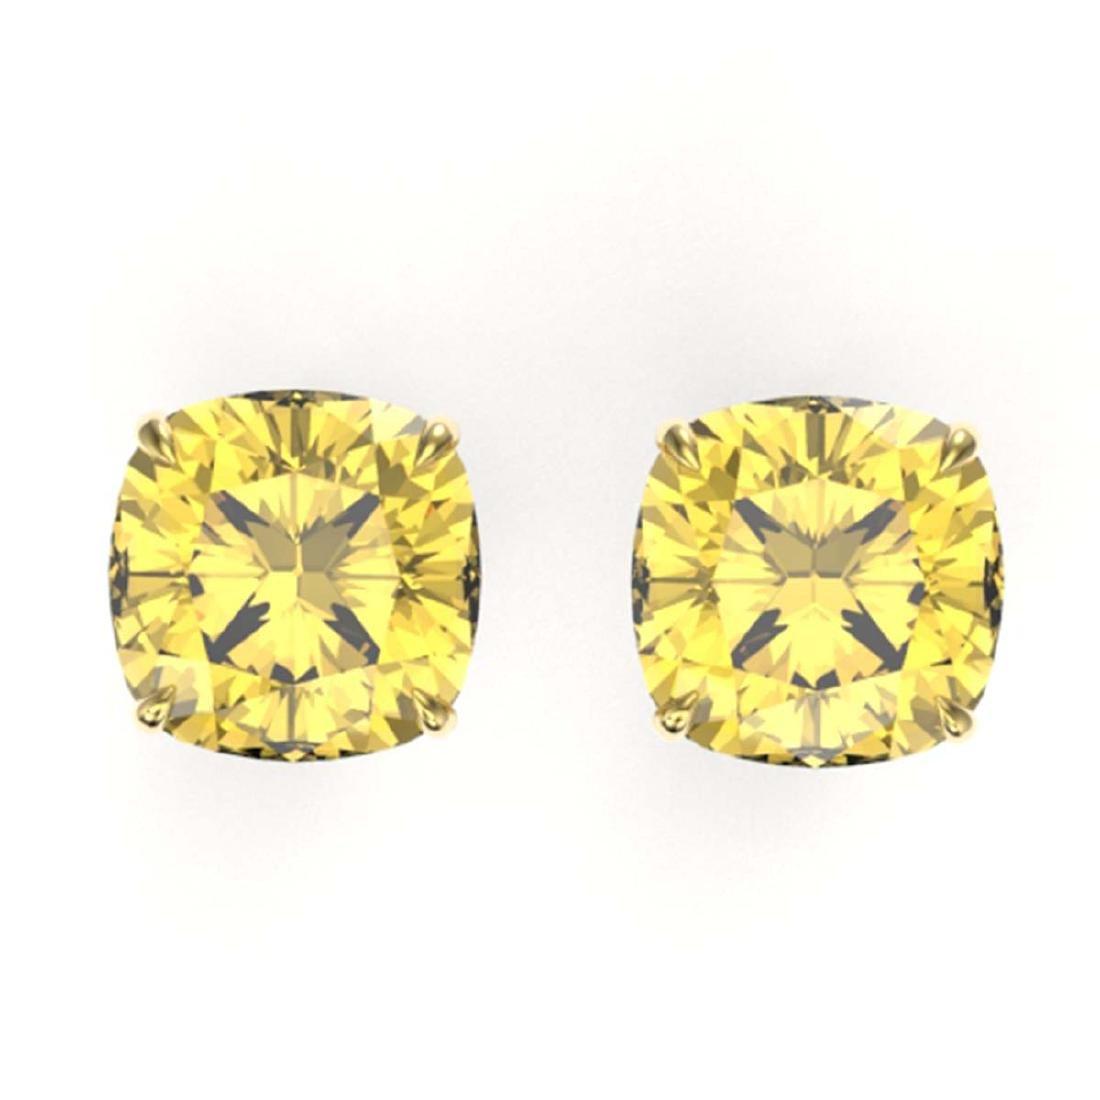 12 ctw Cushion Cut Citrine Stud Earrings 18K Yellow